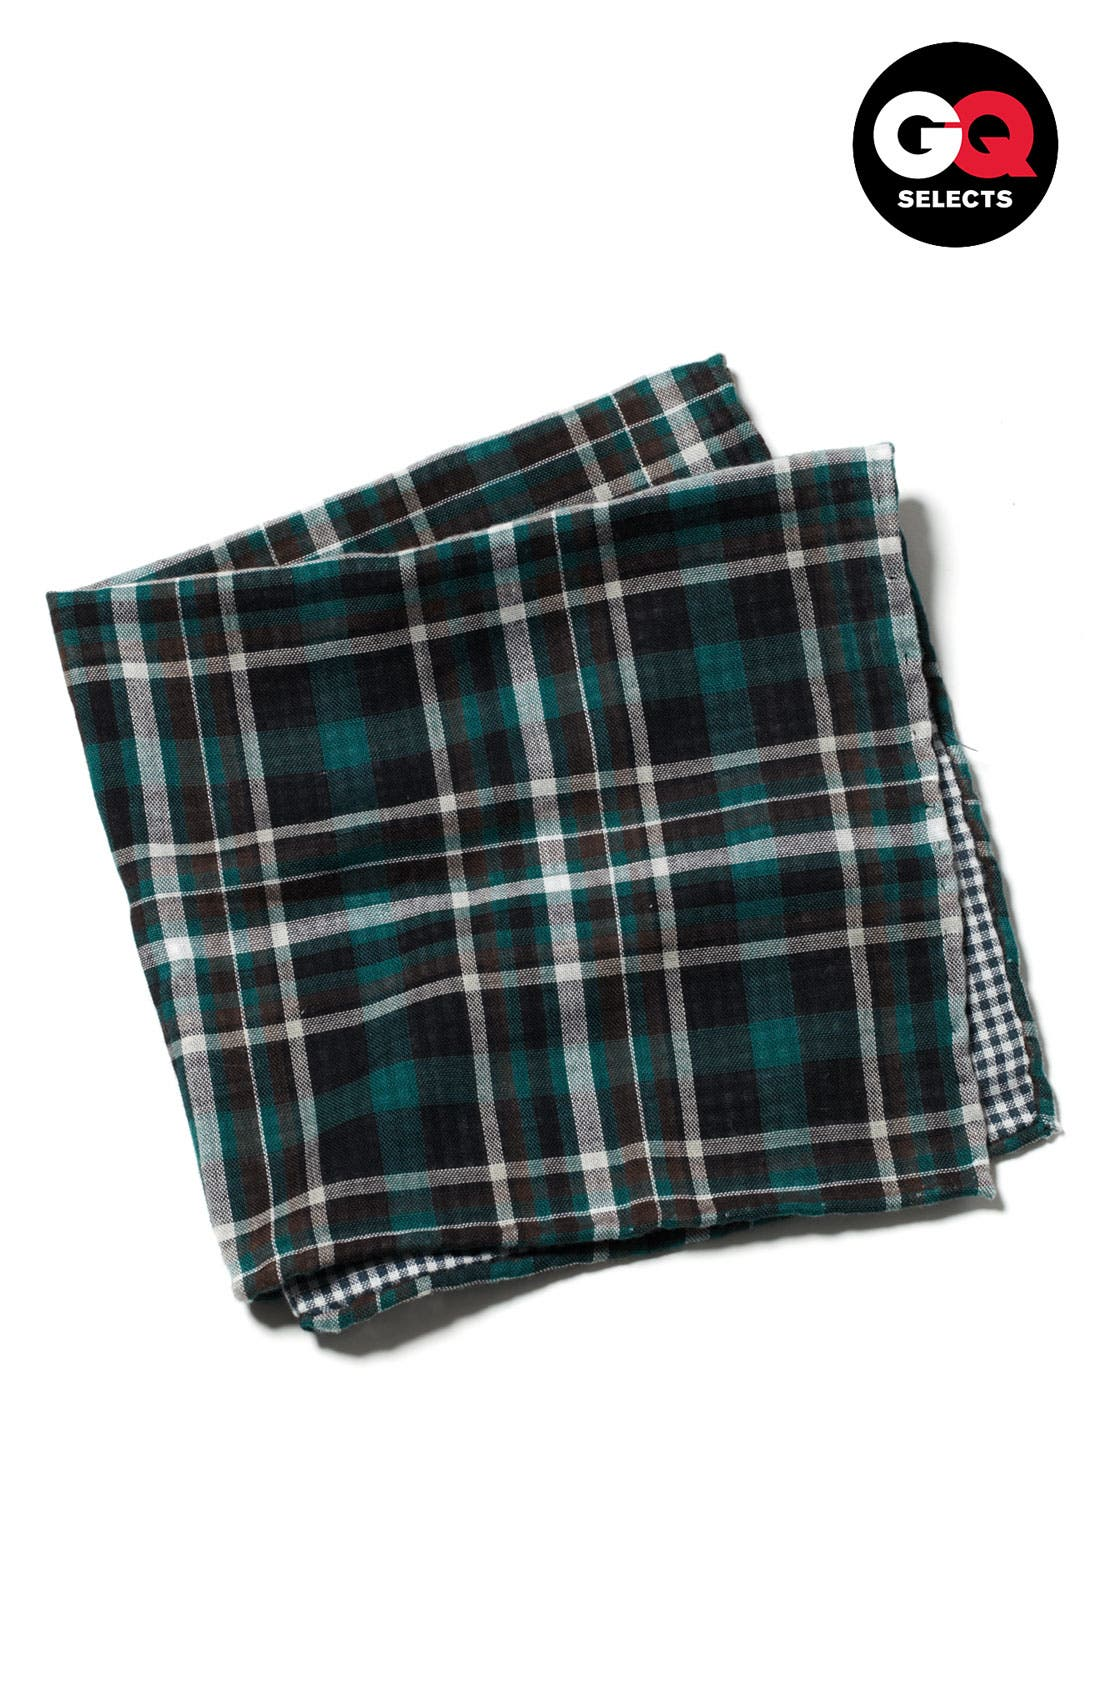 Main Image - The Tie Bar Plaid Cotton Flannel Pocket Square